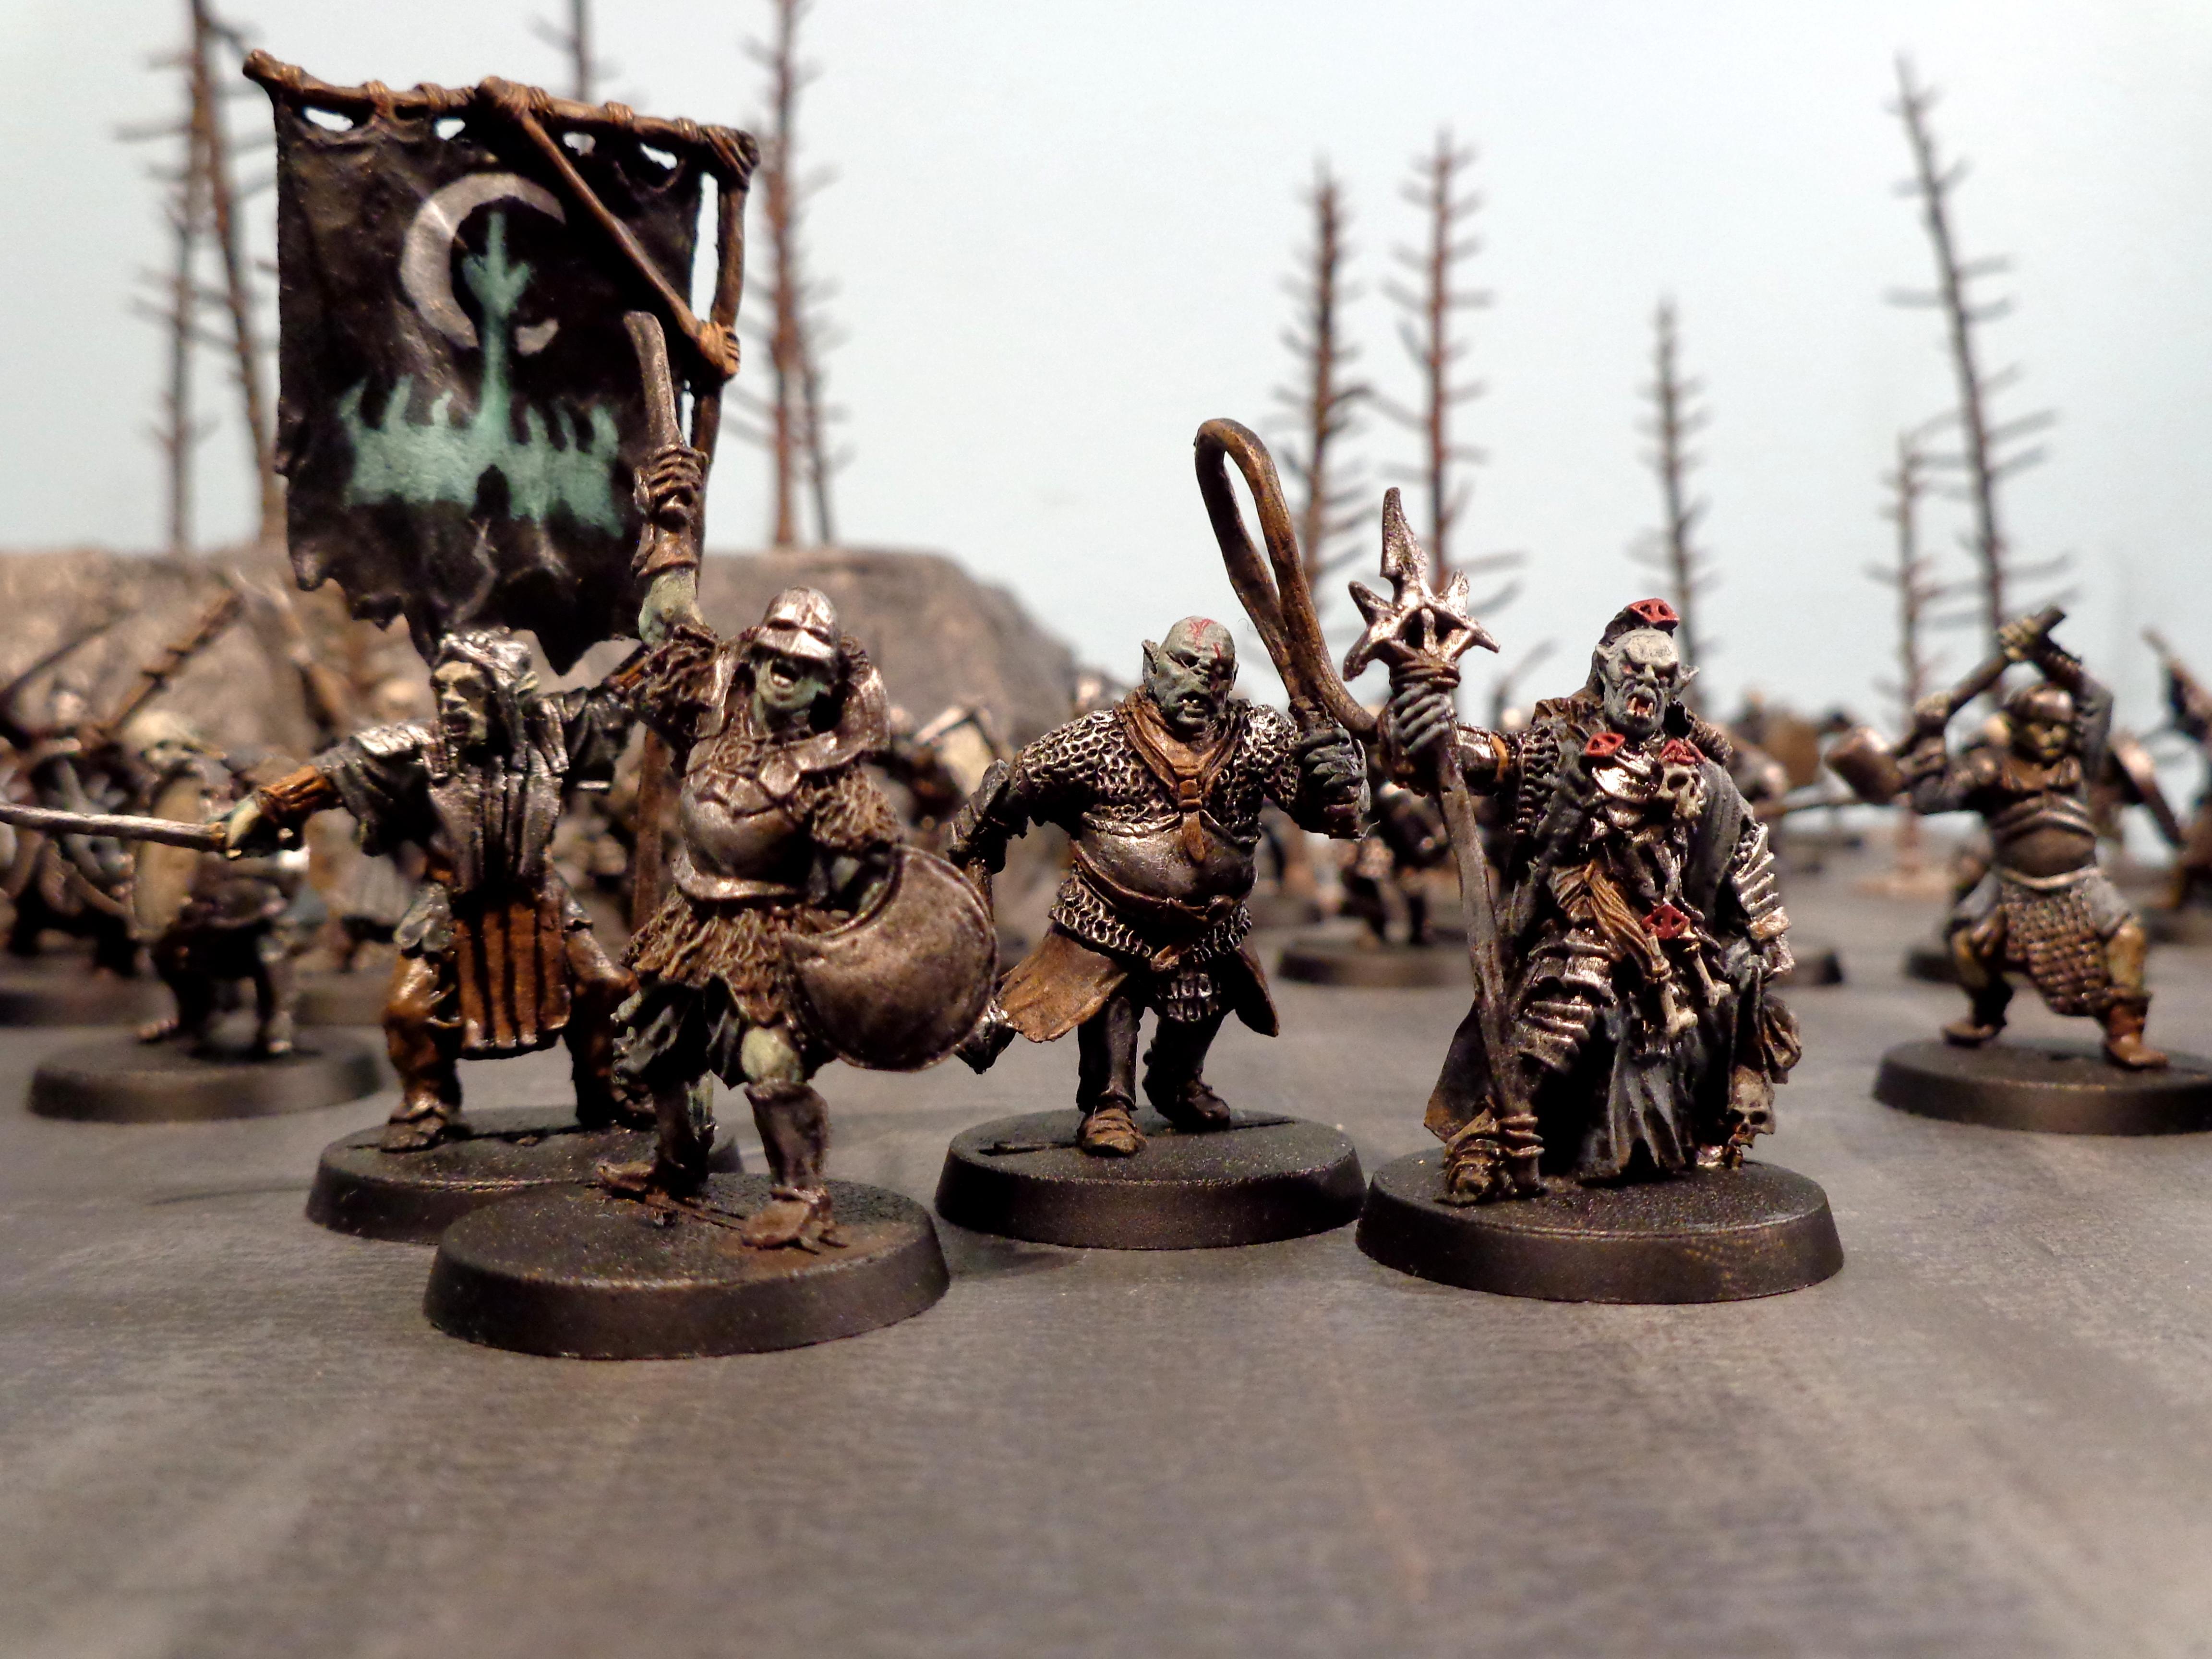 Army, Banner, Minas Morgul, Mordor, Morgul, Orc Commanders, Orcs, Shaman, Taskmaster